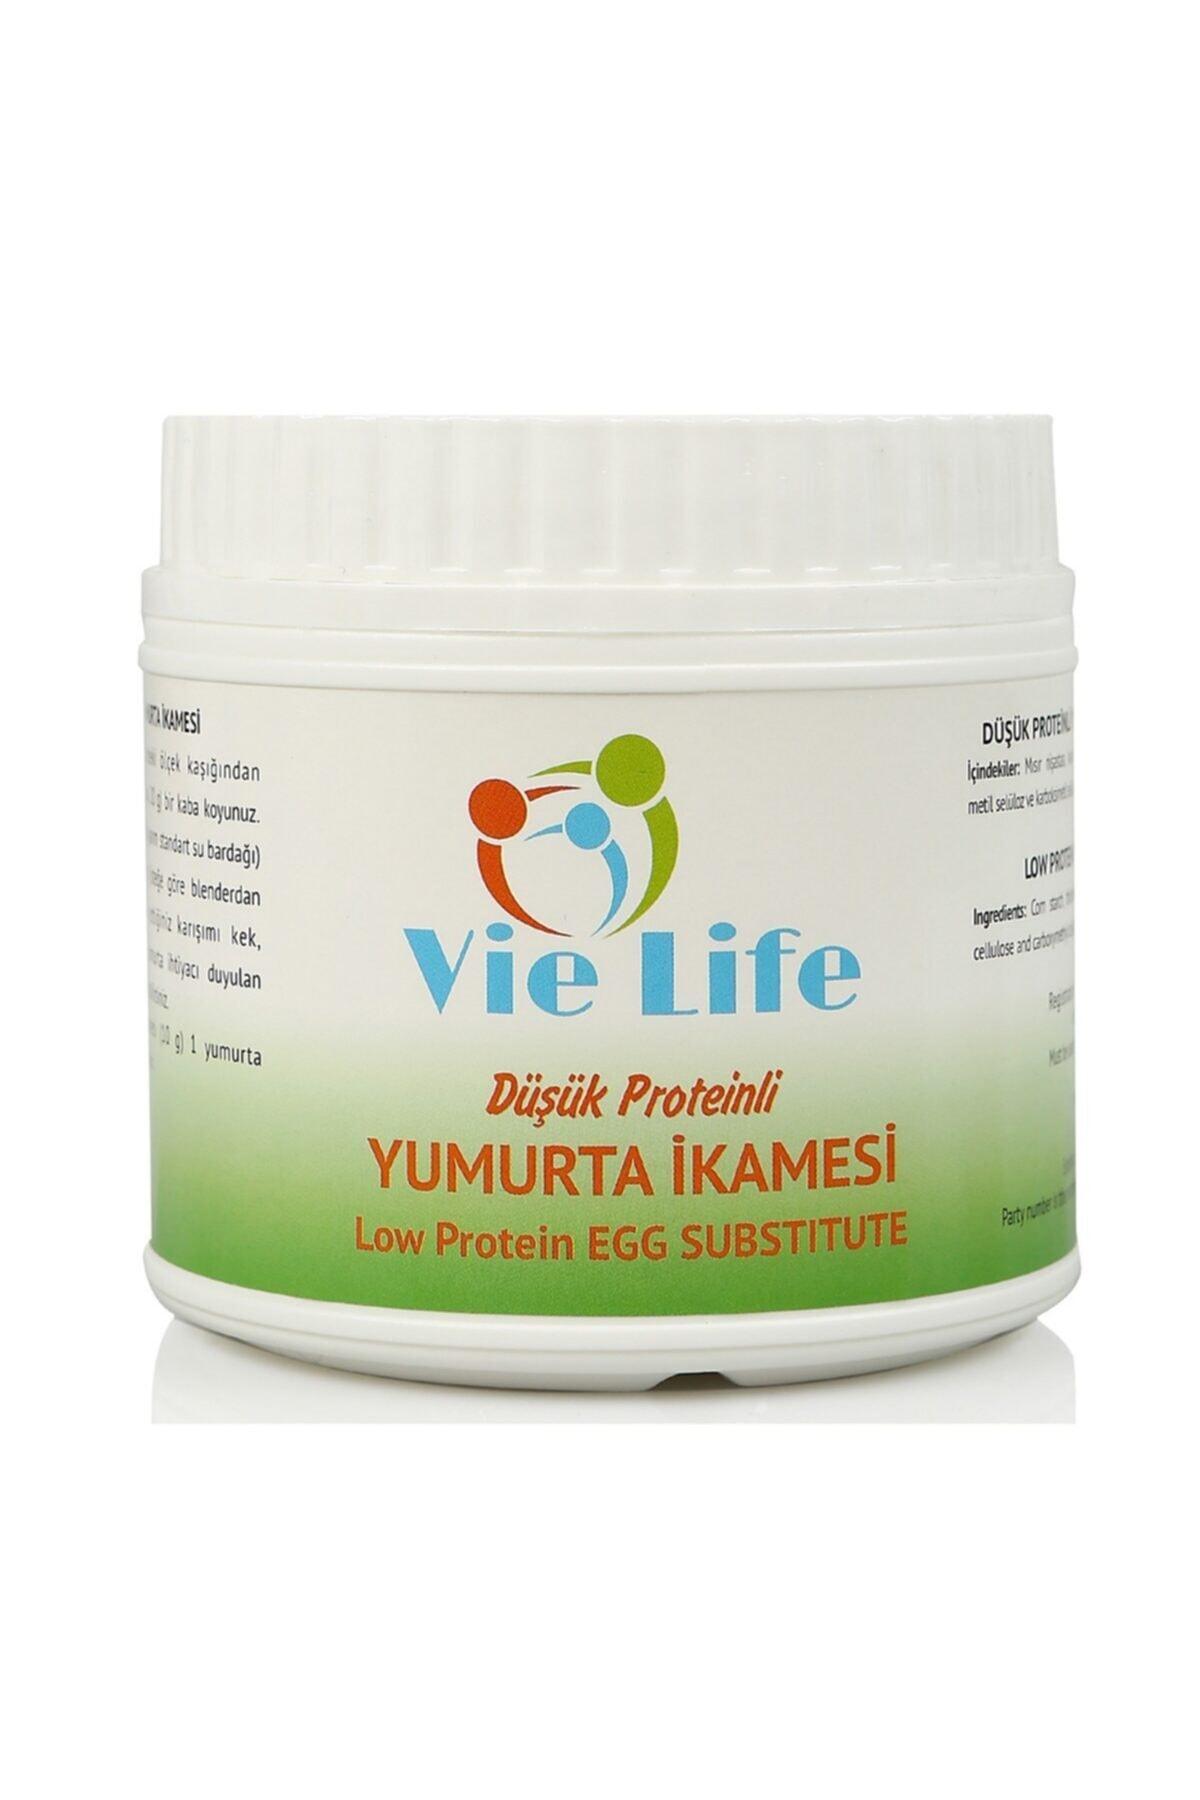 Vie Life Düşük Proteinli Yumurta Ikamesi 300gr 1